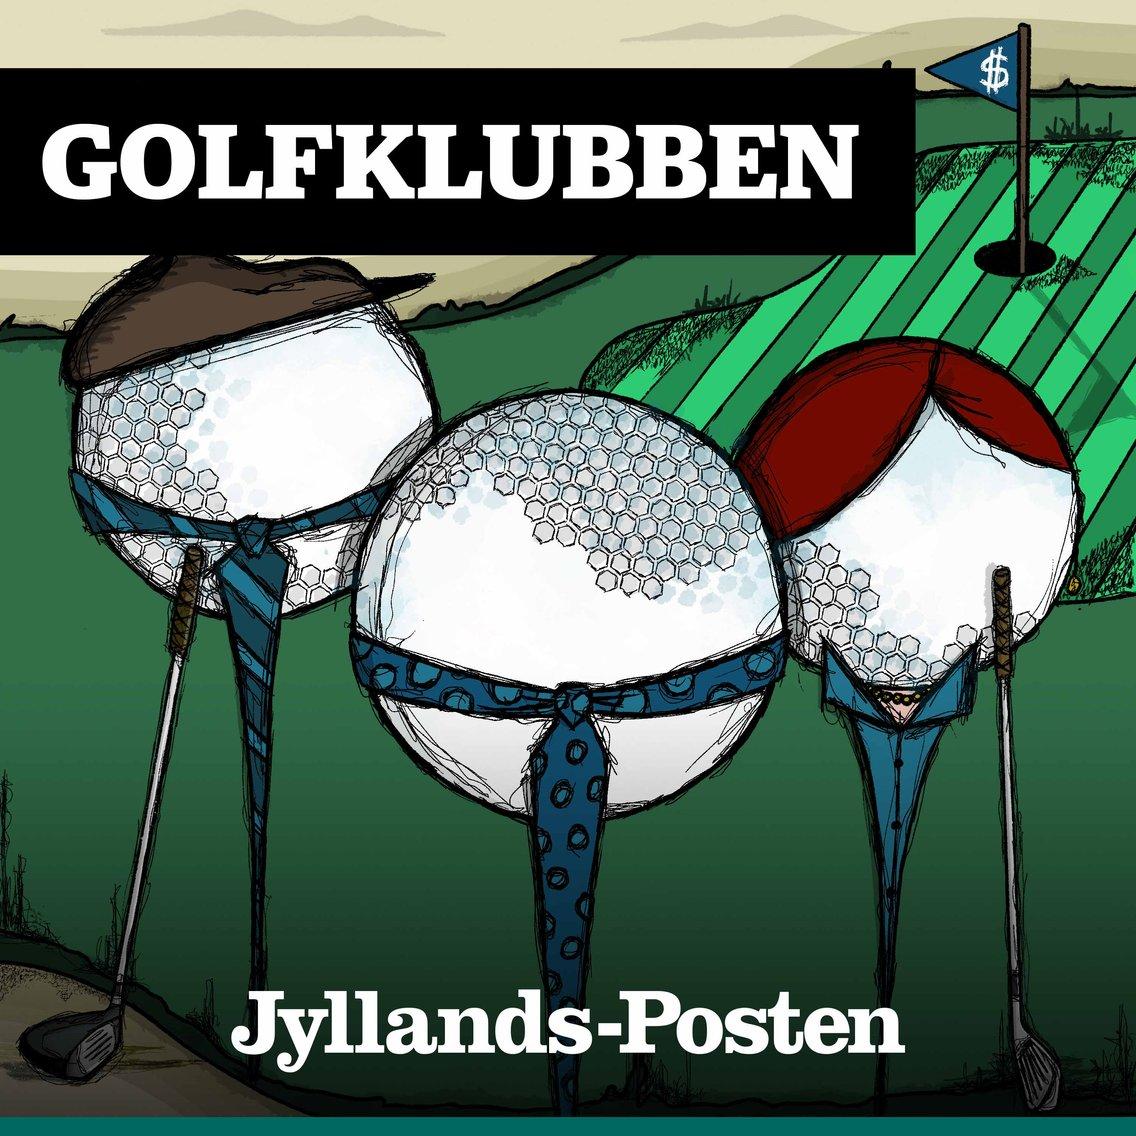 Golfklubben - Cover Image